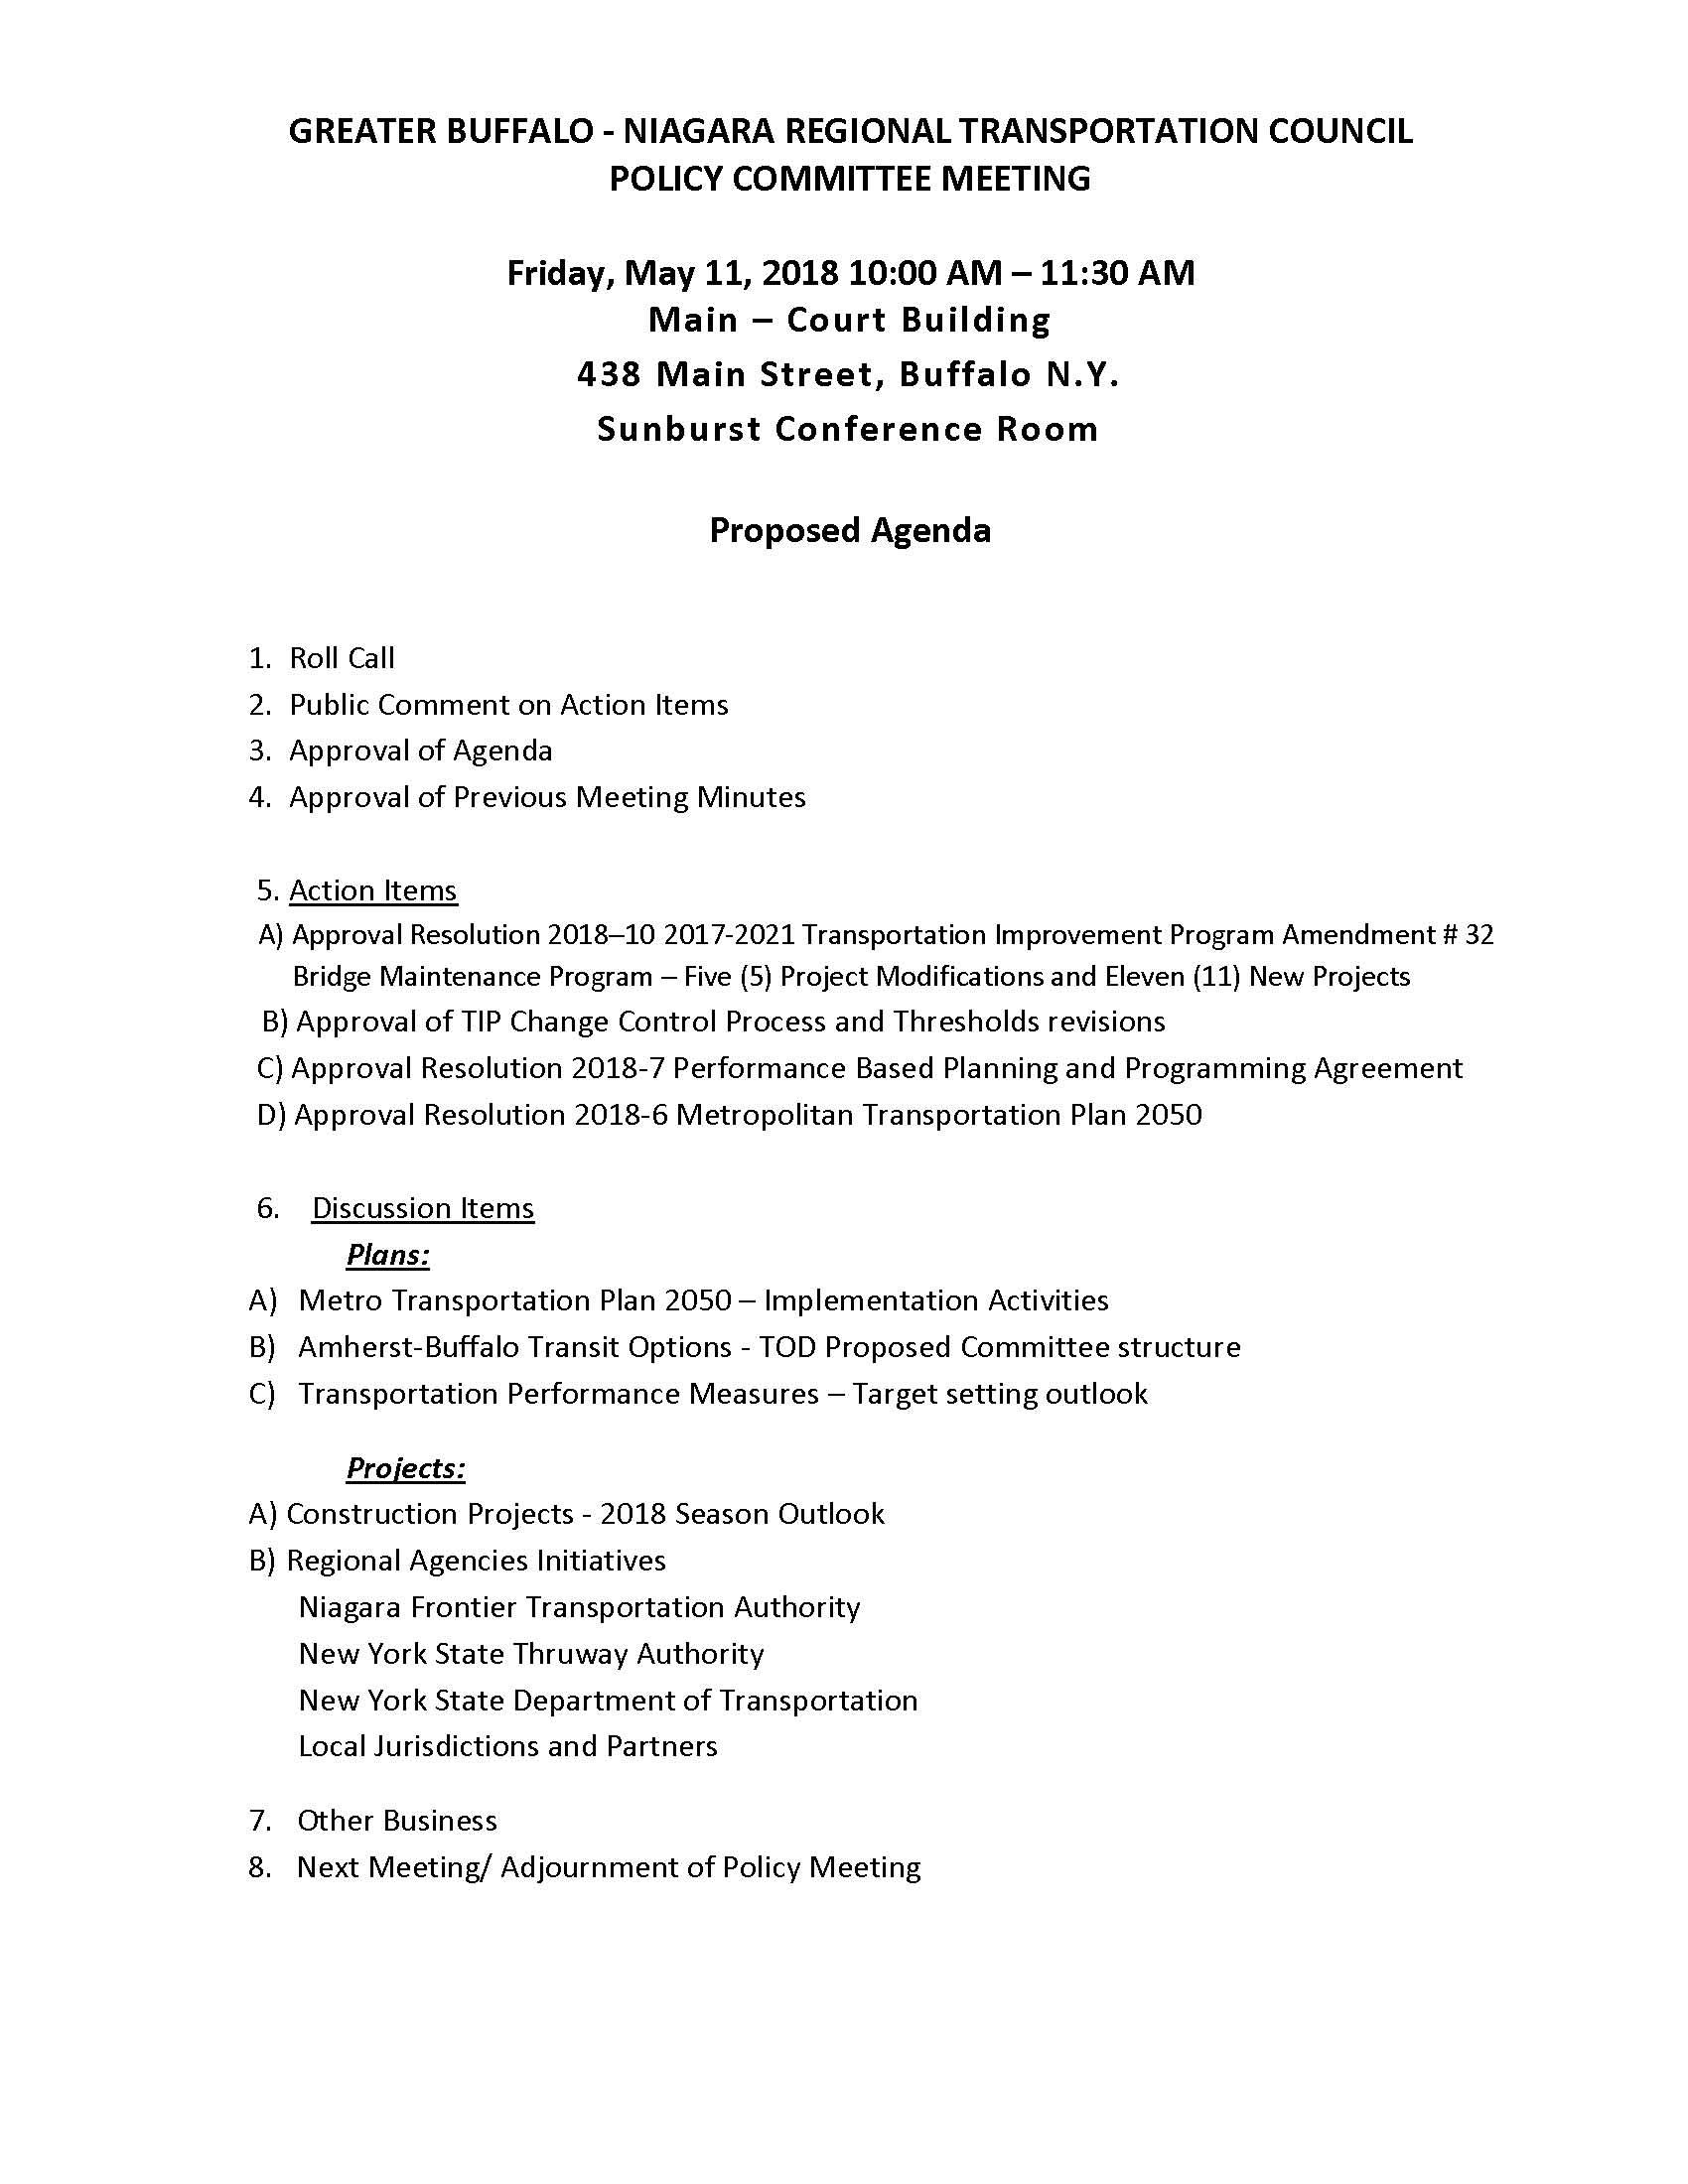 Policy Committee Draft Agenda - May 11, 2018.jpg